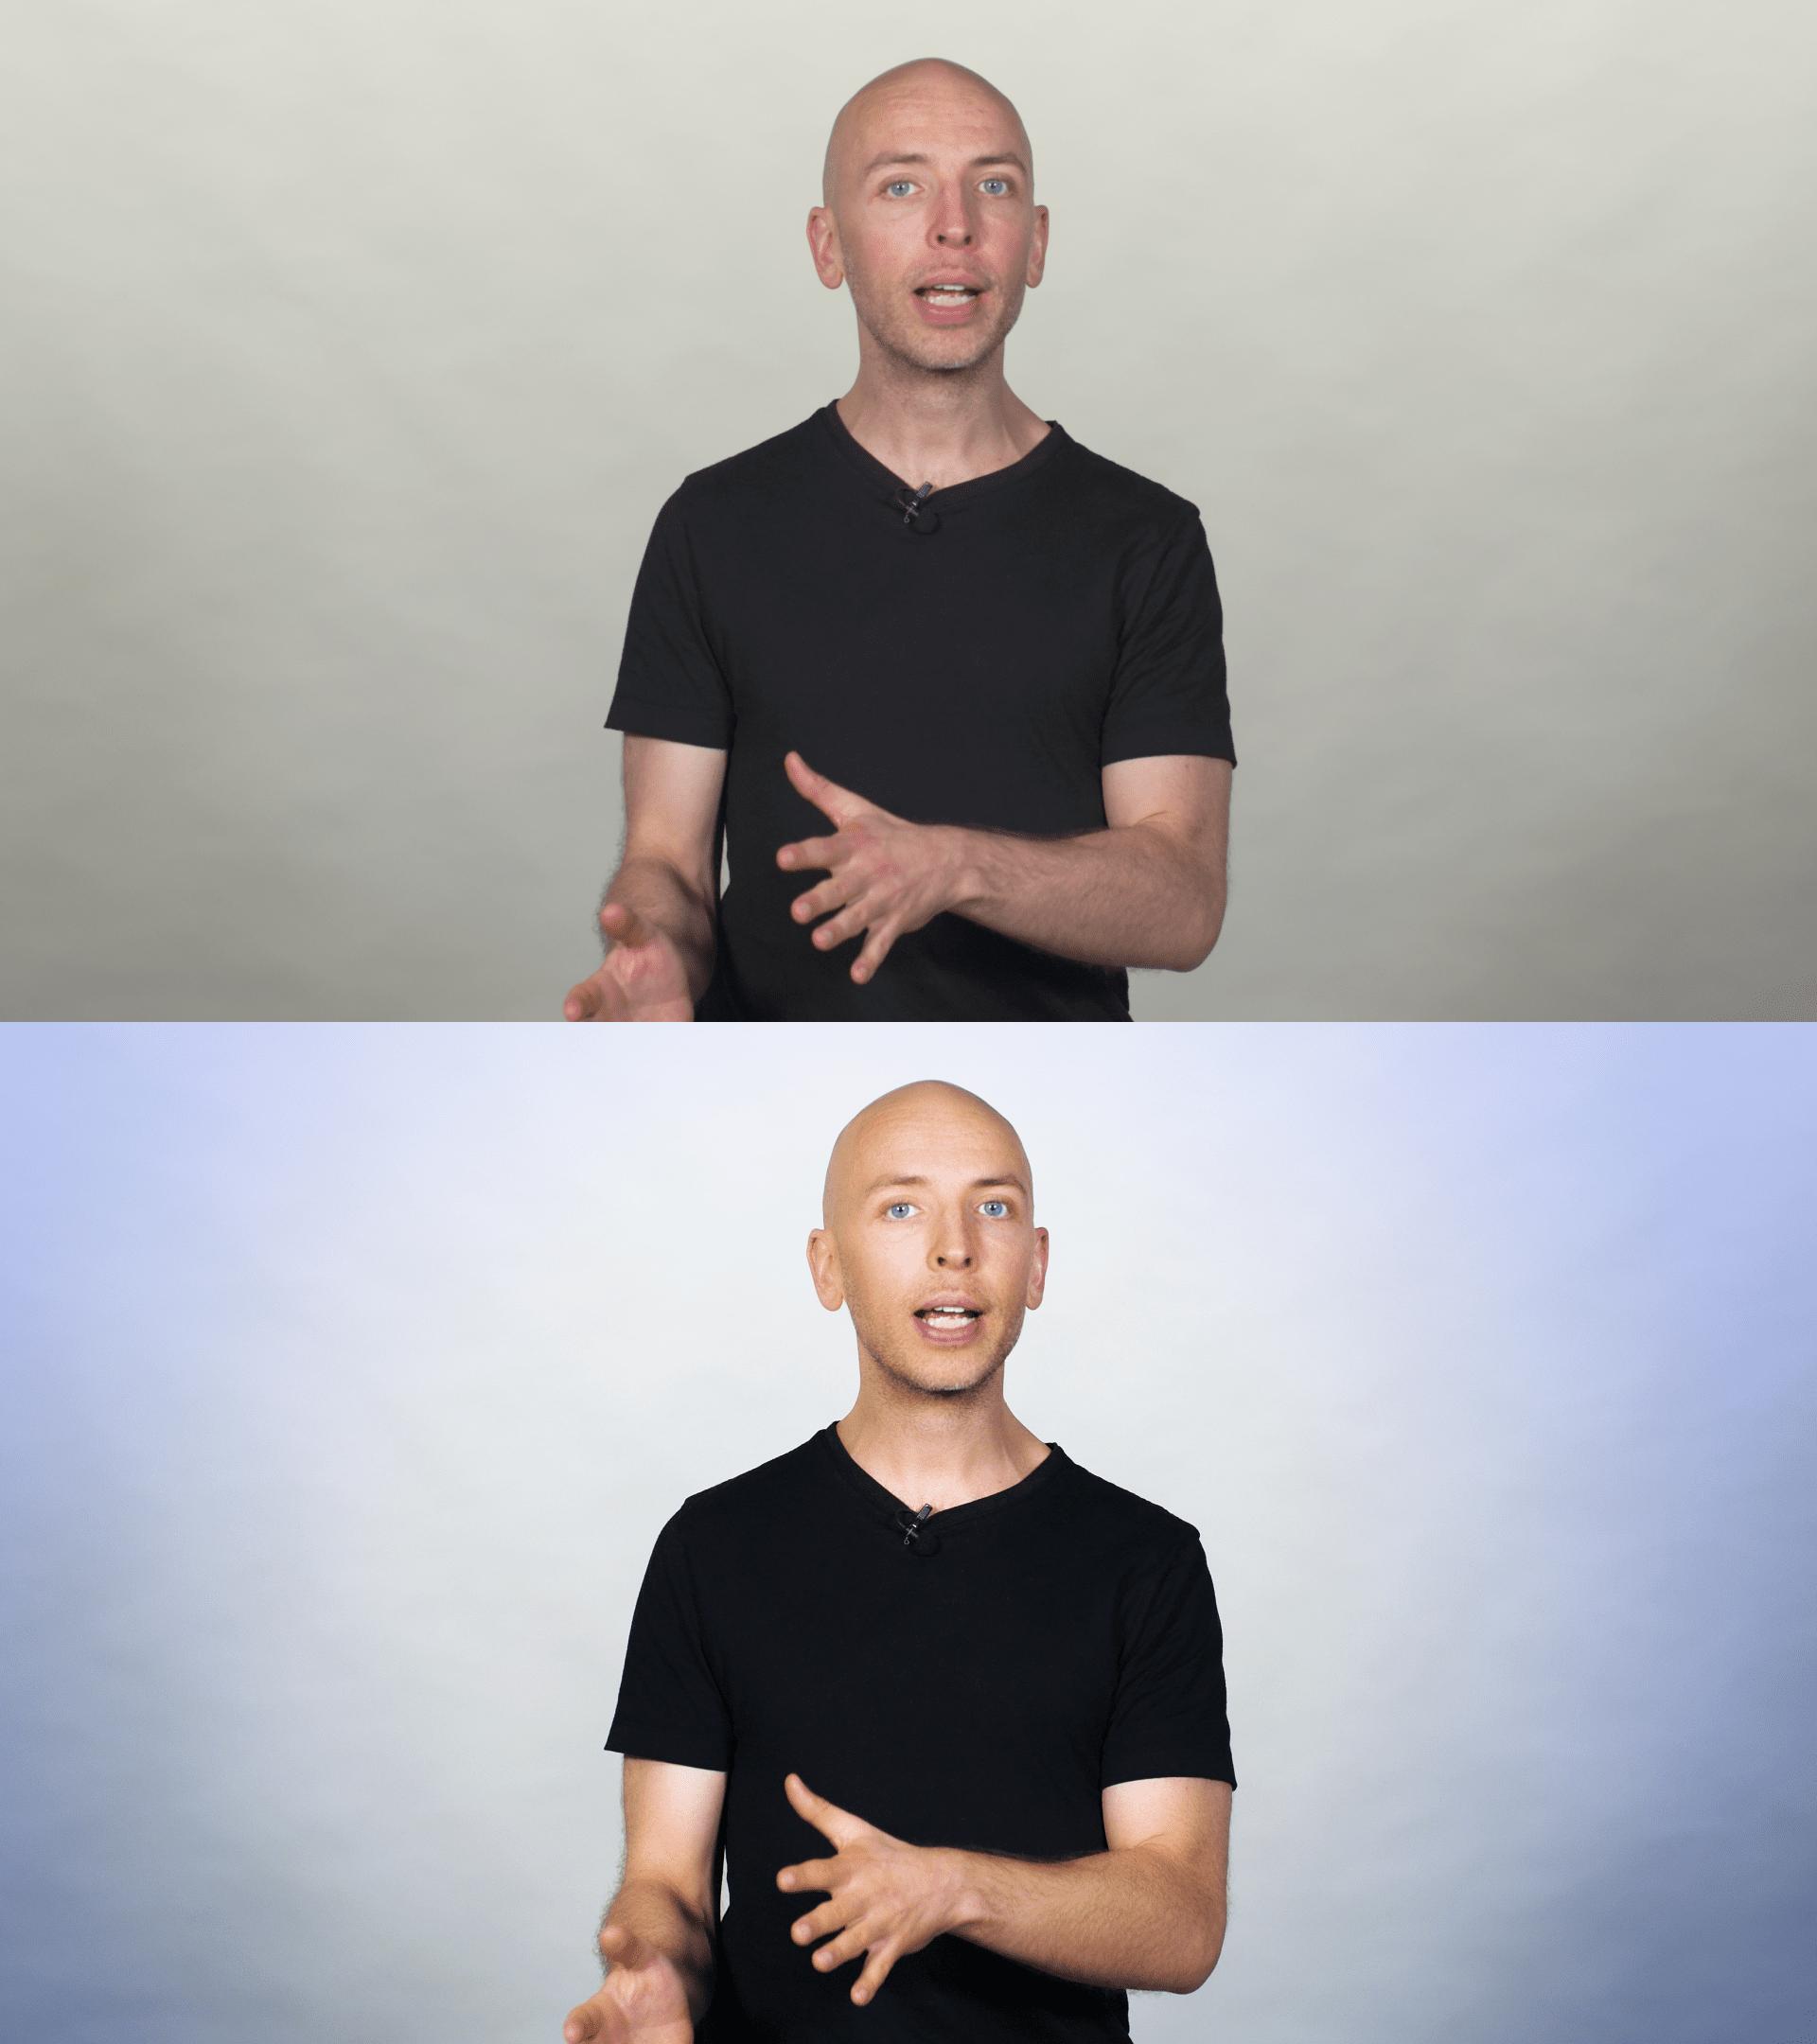 Raw vs edited video